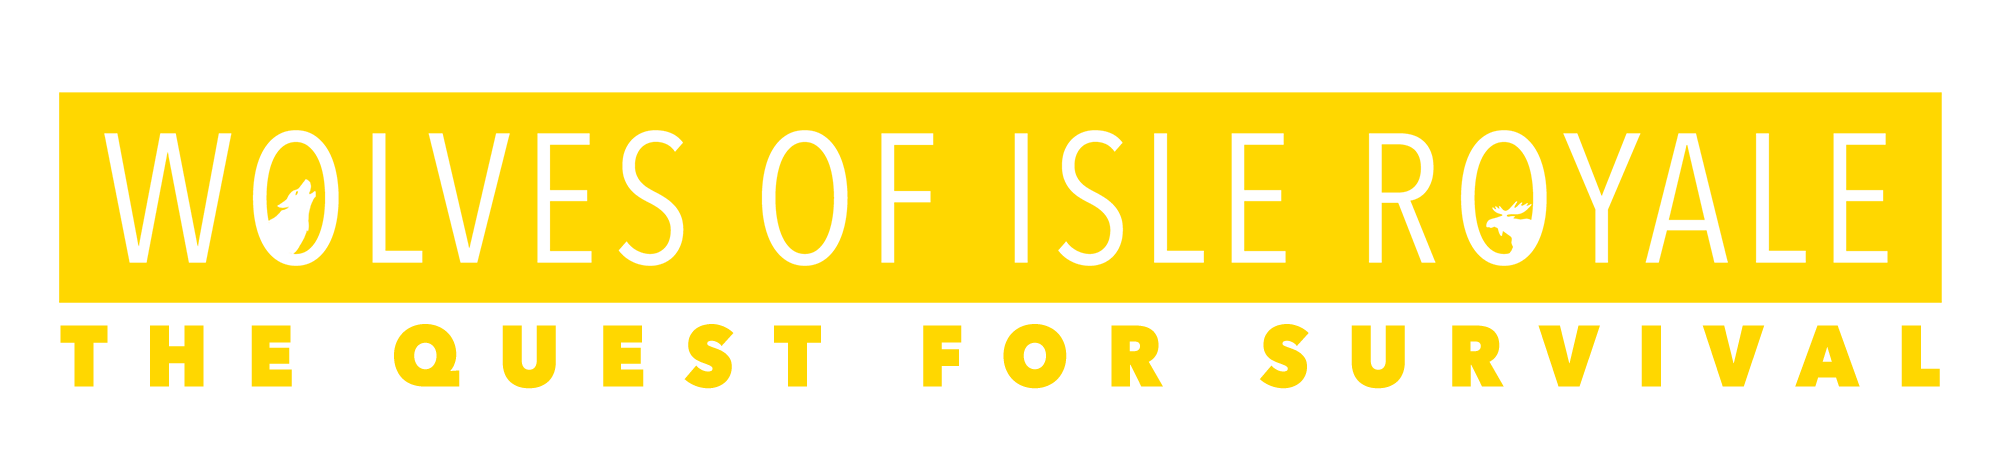 title-logo-3